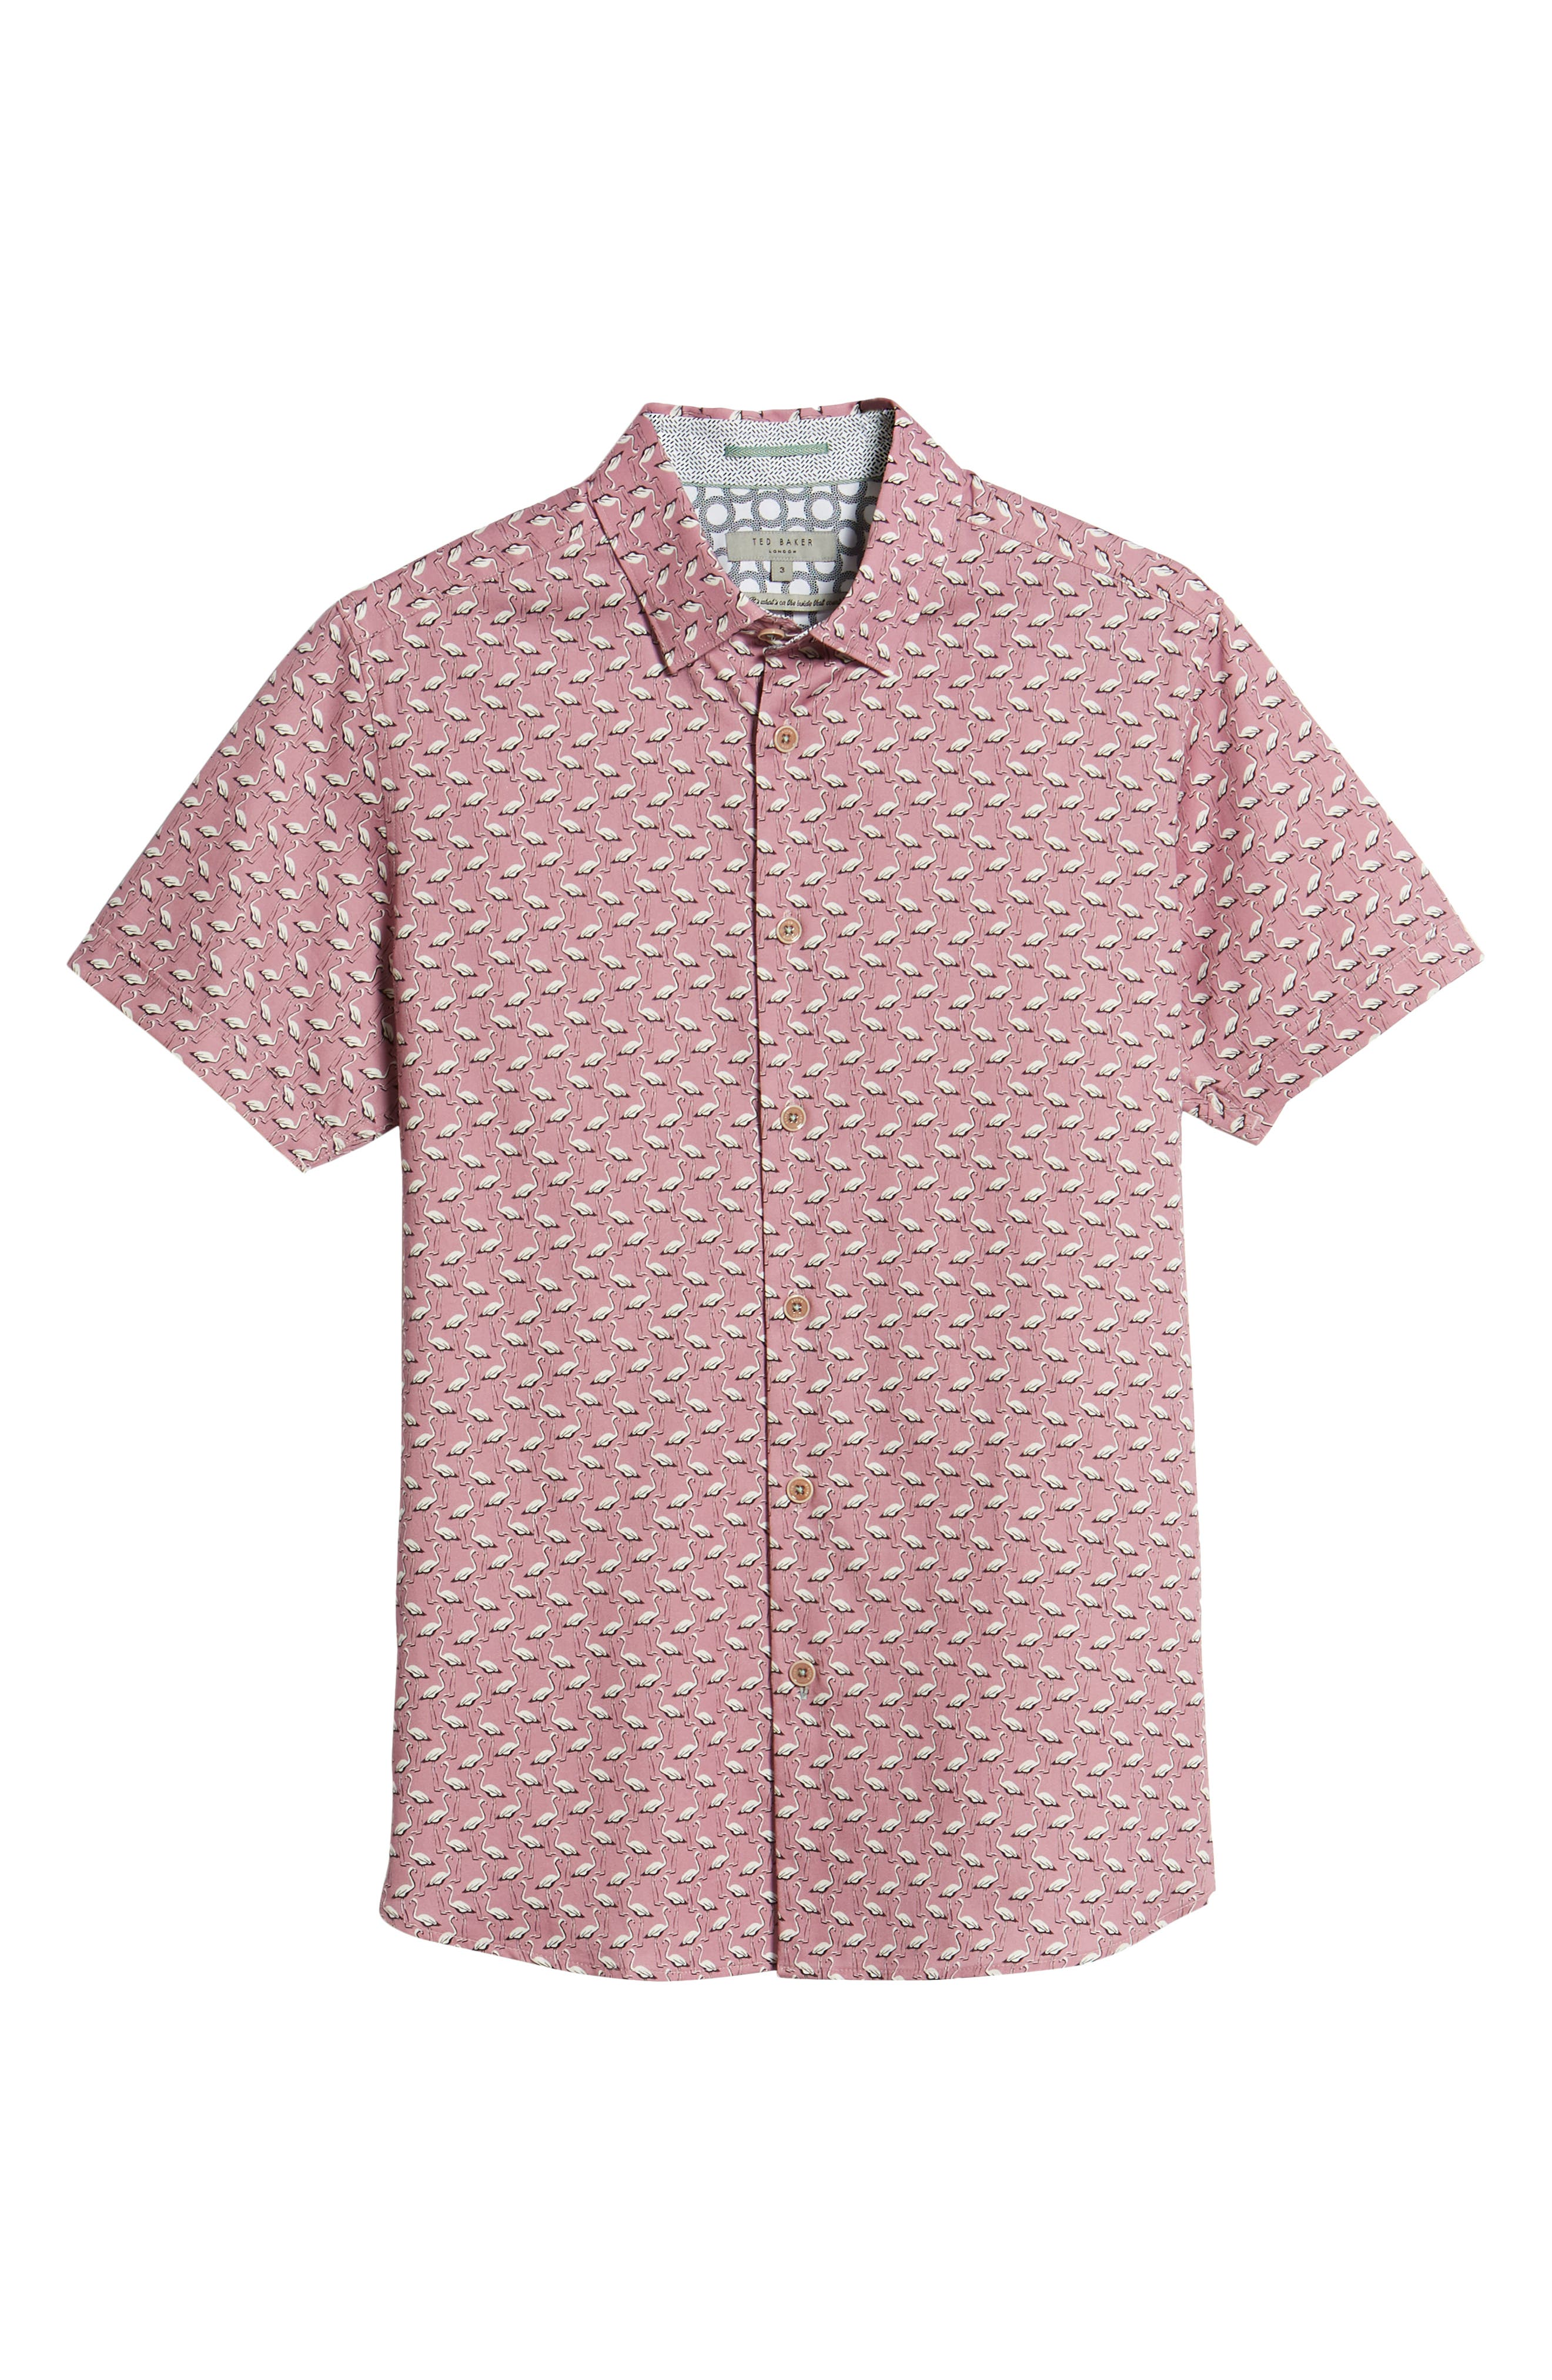 Norflam Flamingo Print Sport Shirt,                             Alternate thumbnail 6, color,                             650